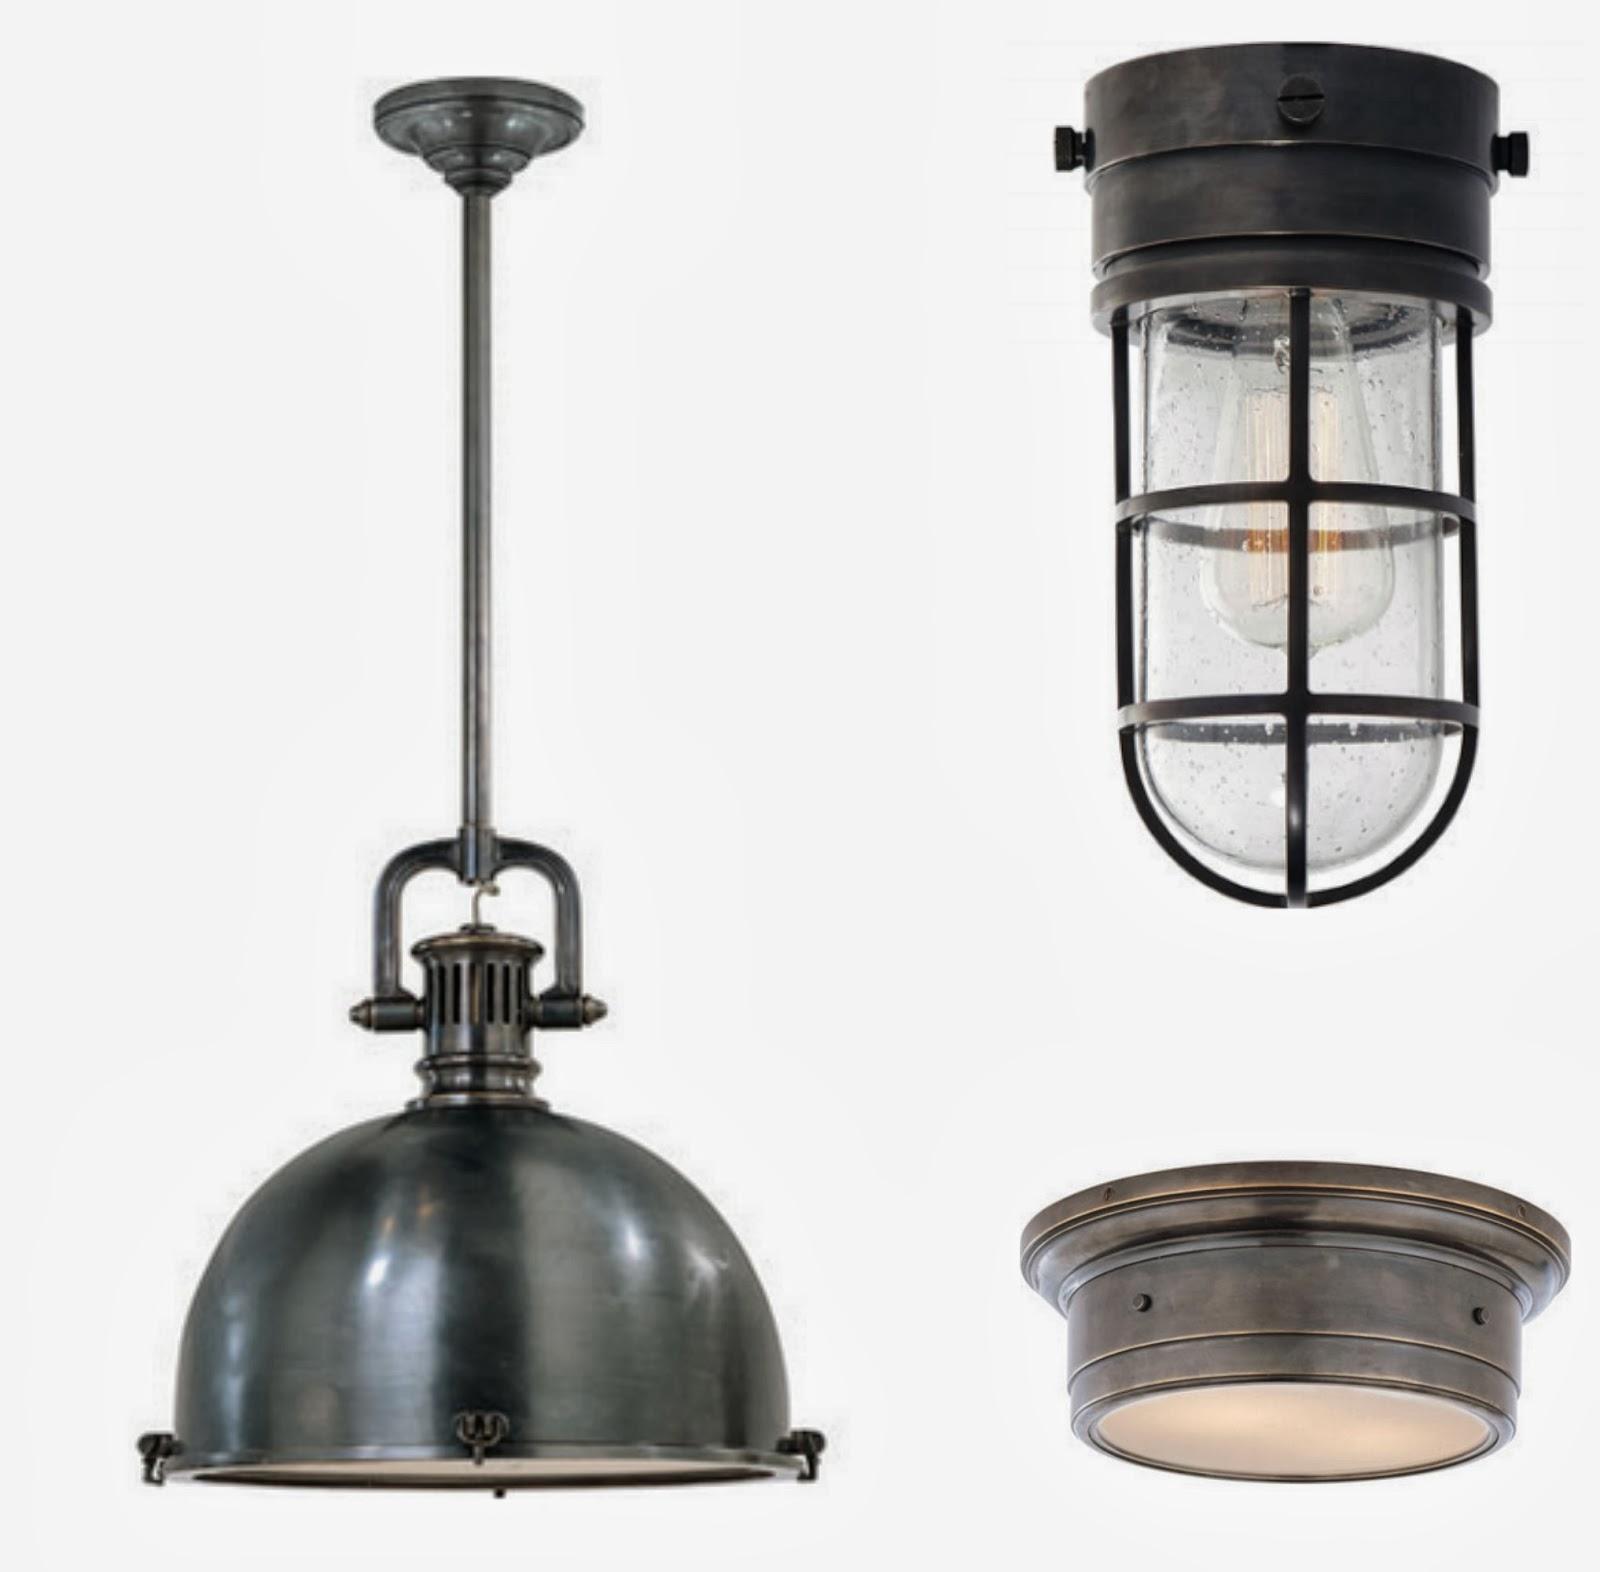 circa 39 s yoke pendant marine flush mount and siena flush mount. Black Bedroom Furniture Sets. Home Design Ideas